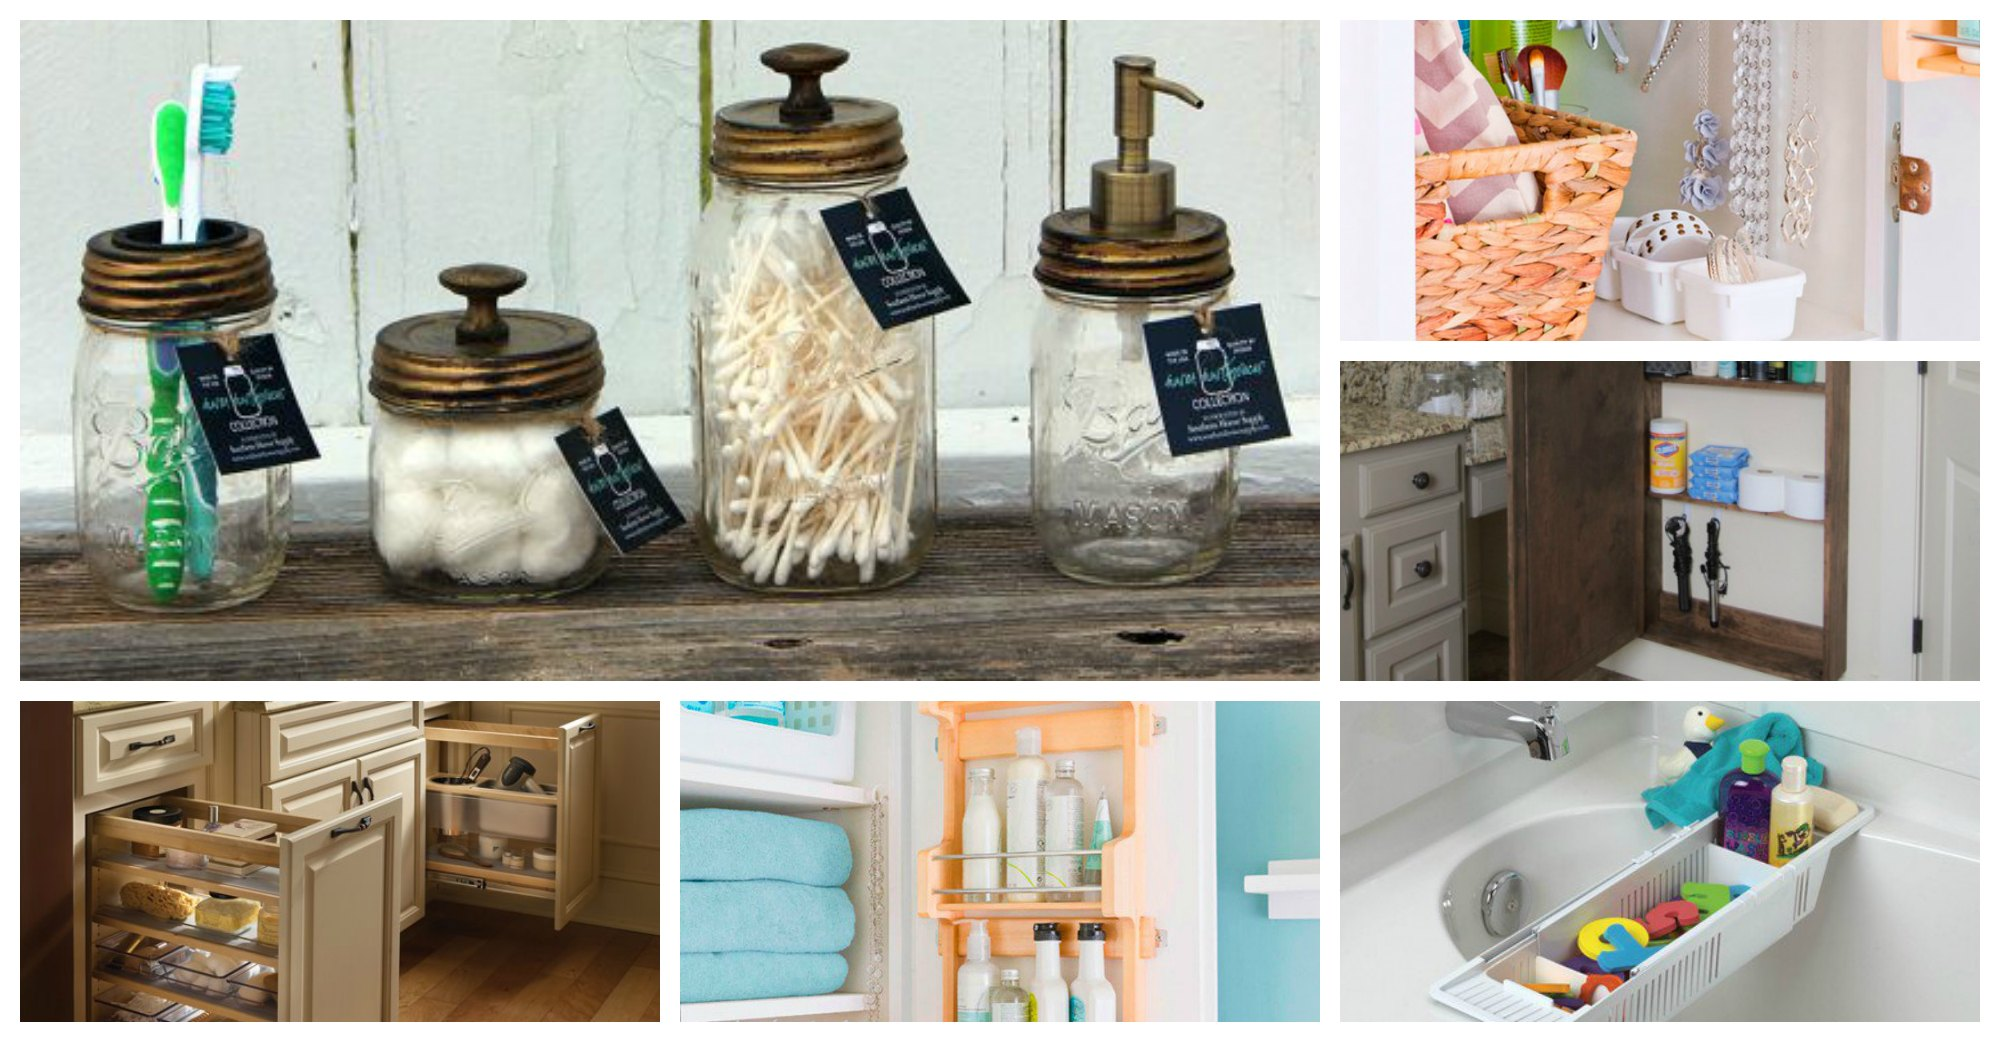 21 Clever Bathroom Storage Ideas